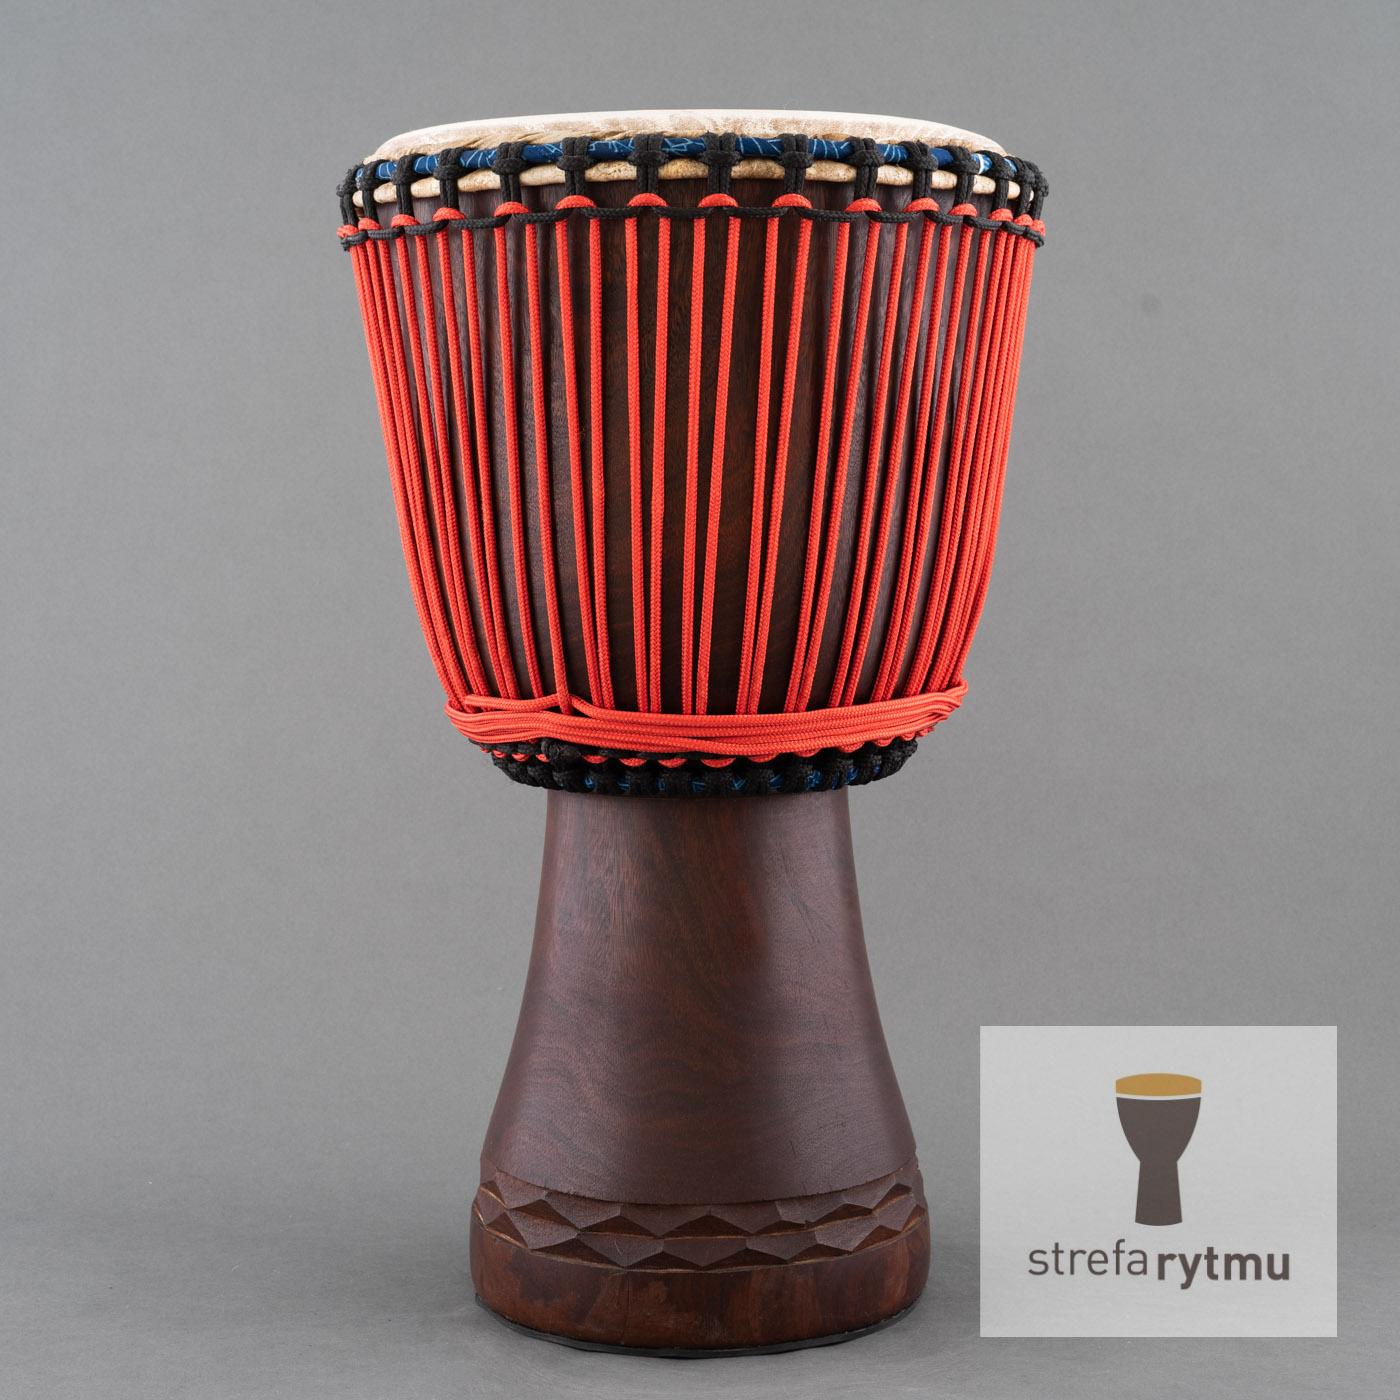 djembe from Mali